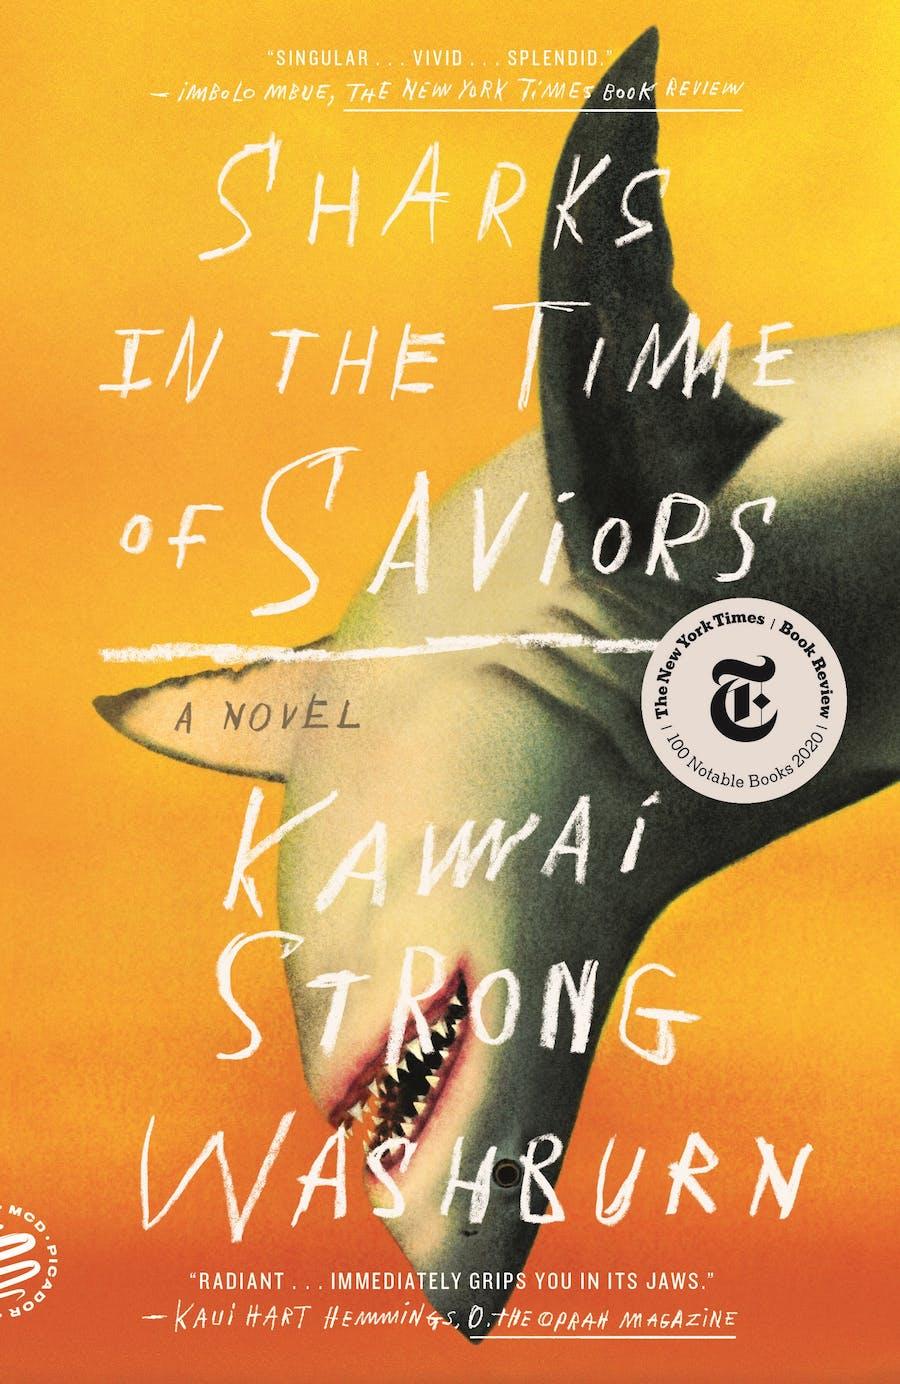 Sharks in the Time of Saviors by Kawai Strong Washburn